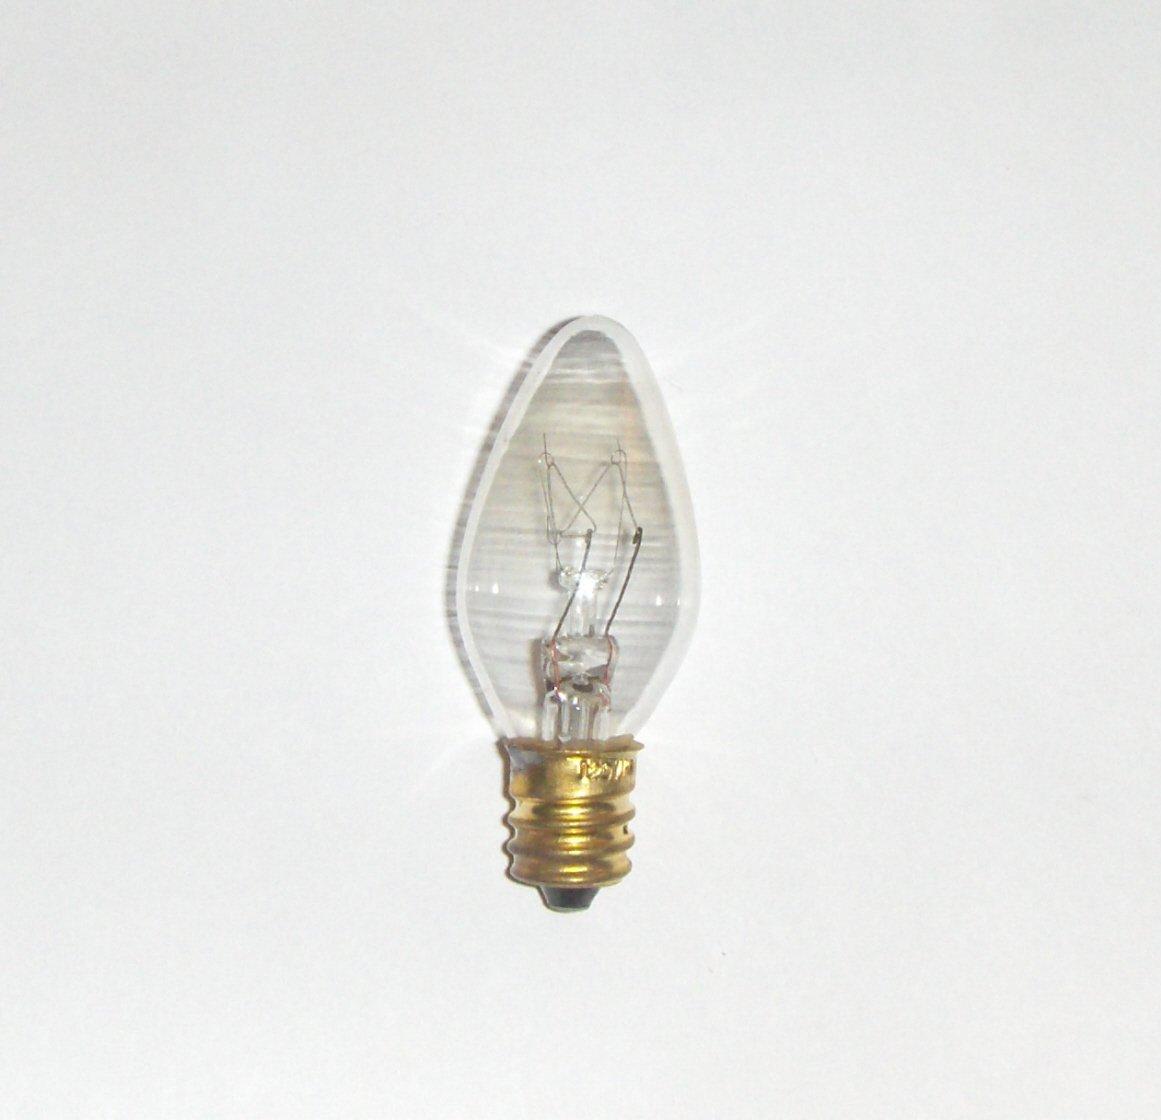 15 Watt Steady Burn Light Bulb